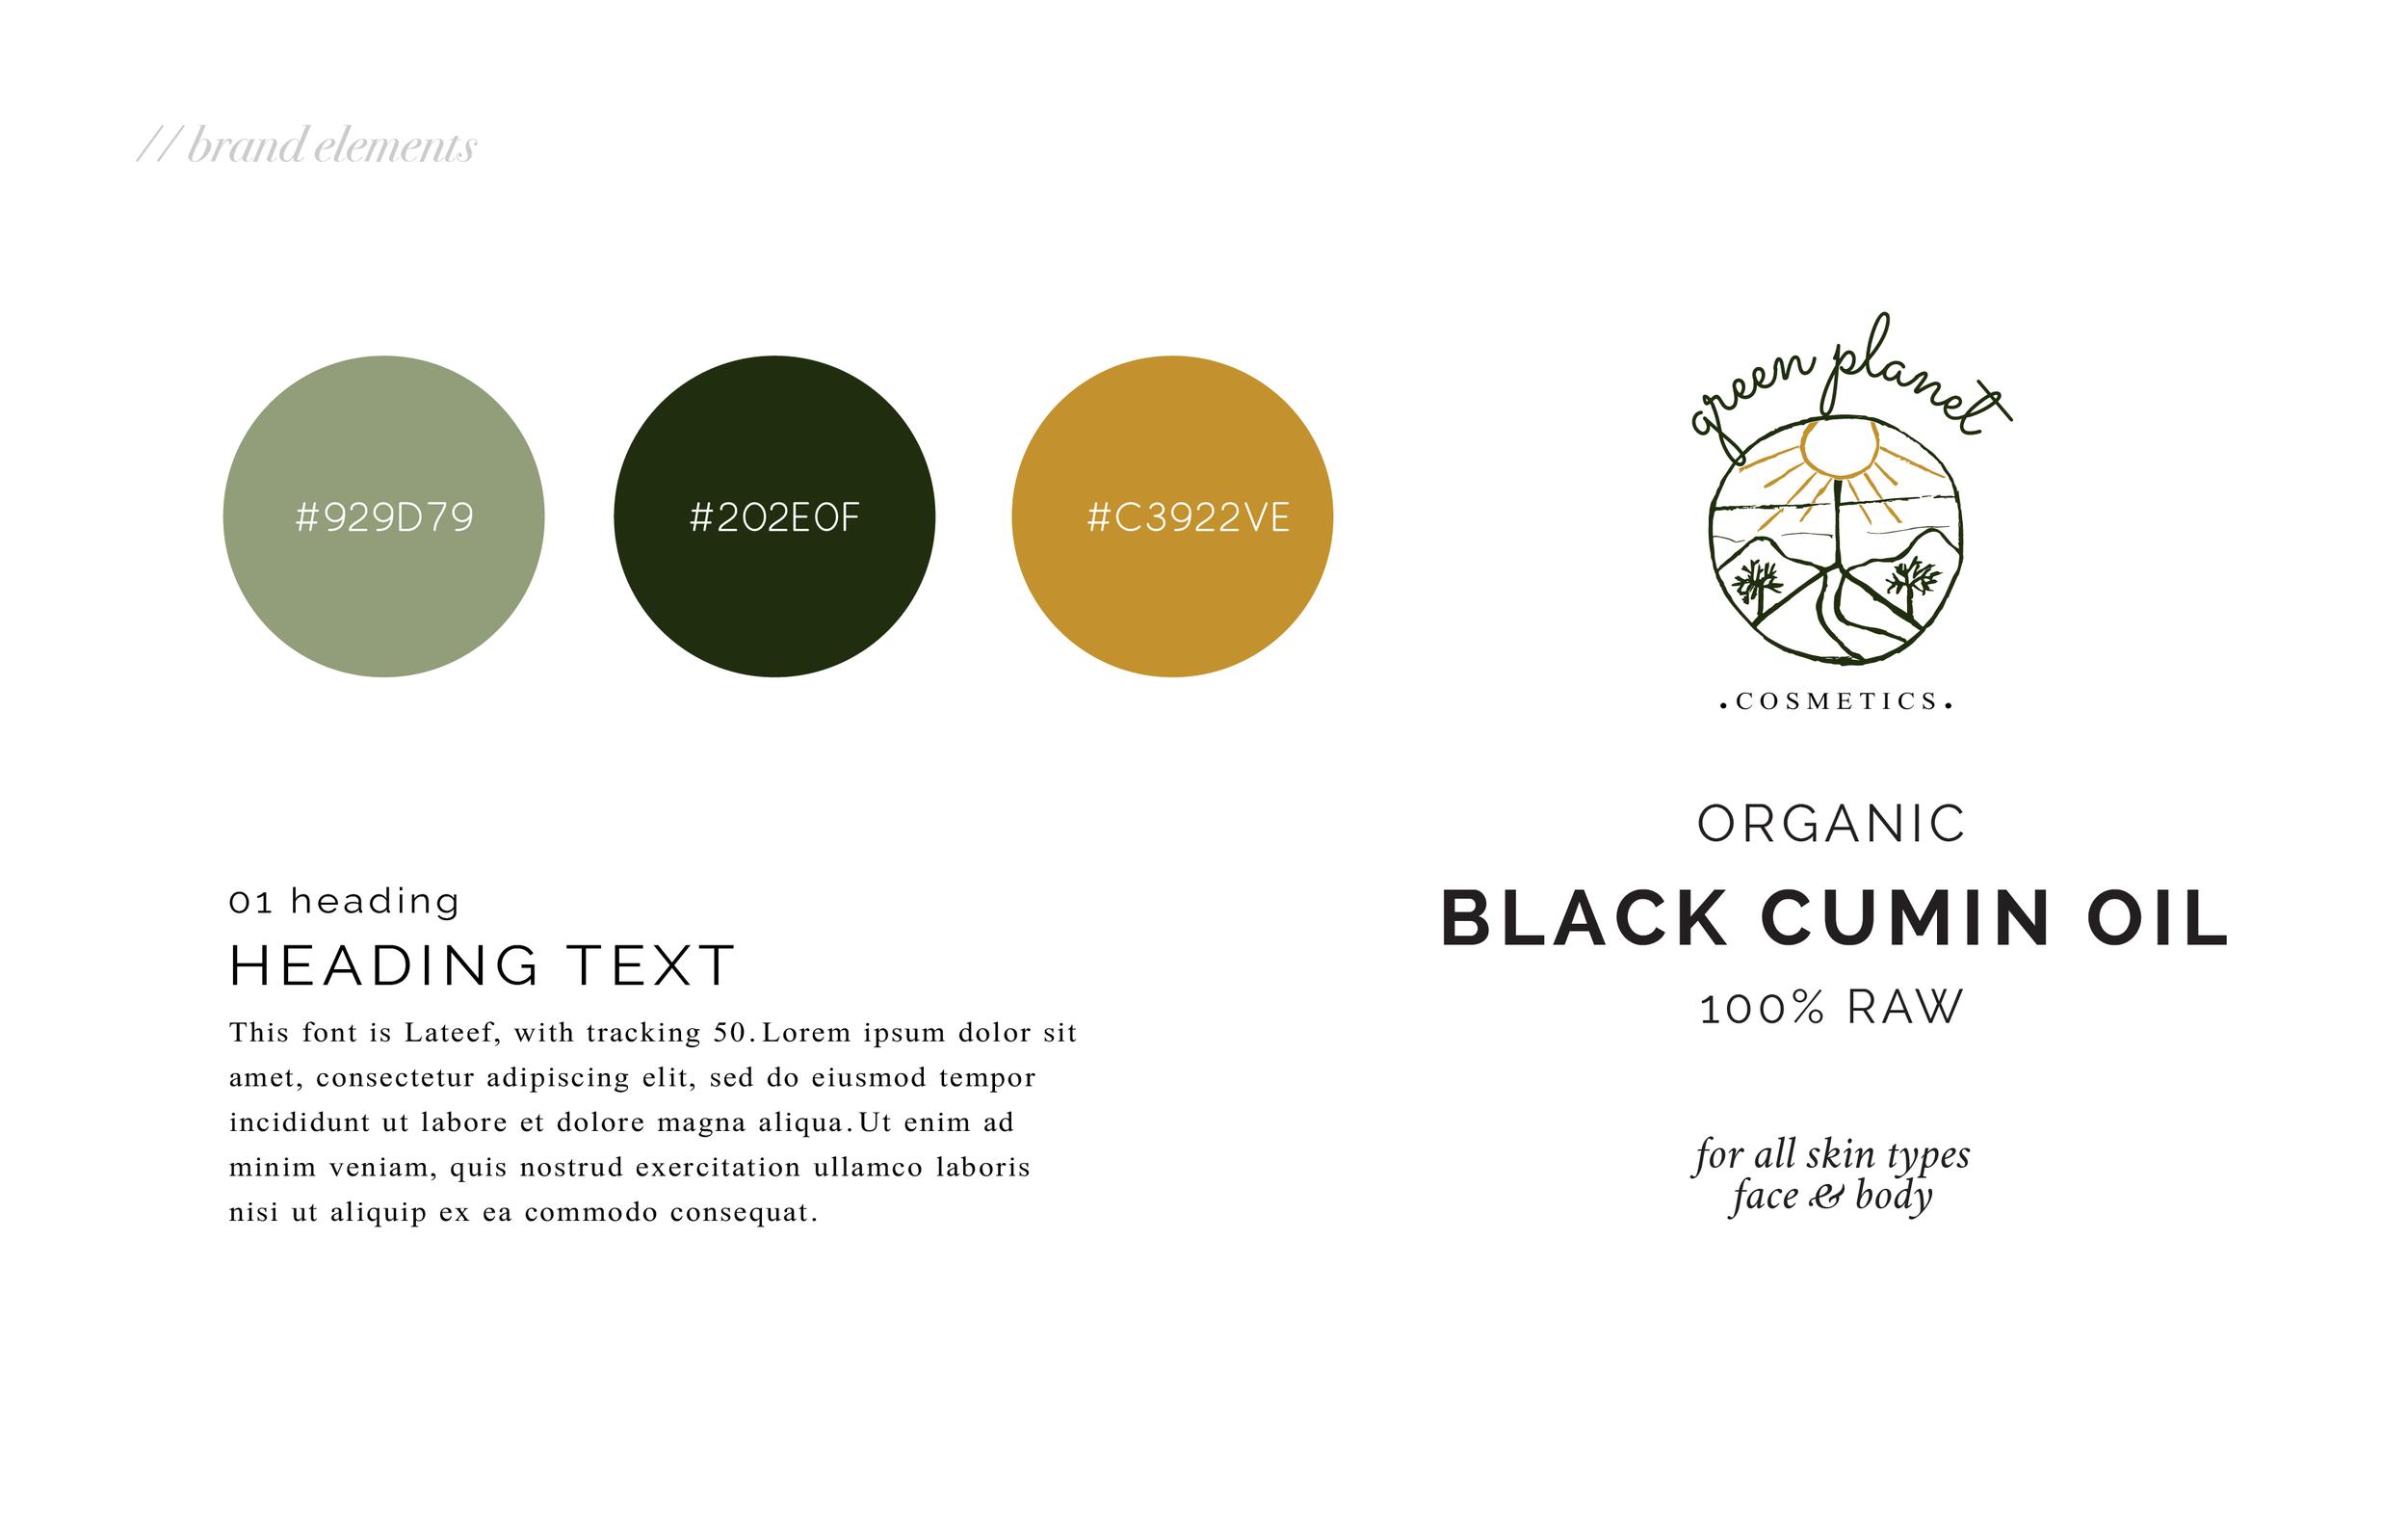 Green planet cosmetics brand board